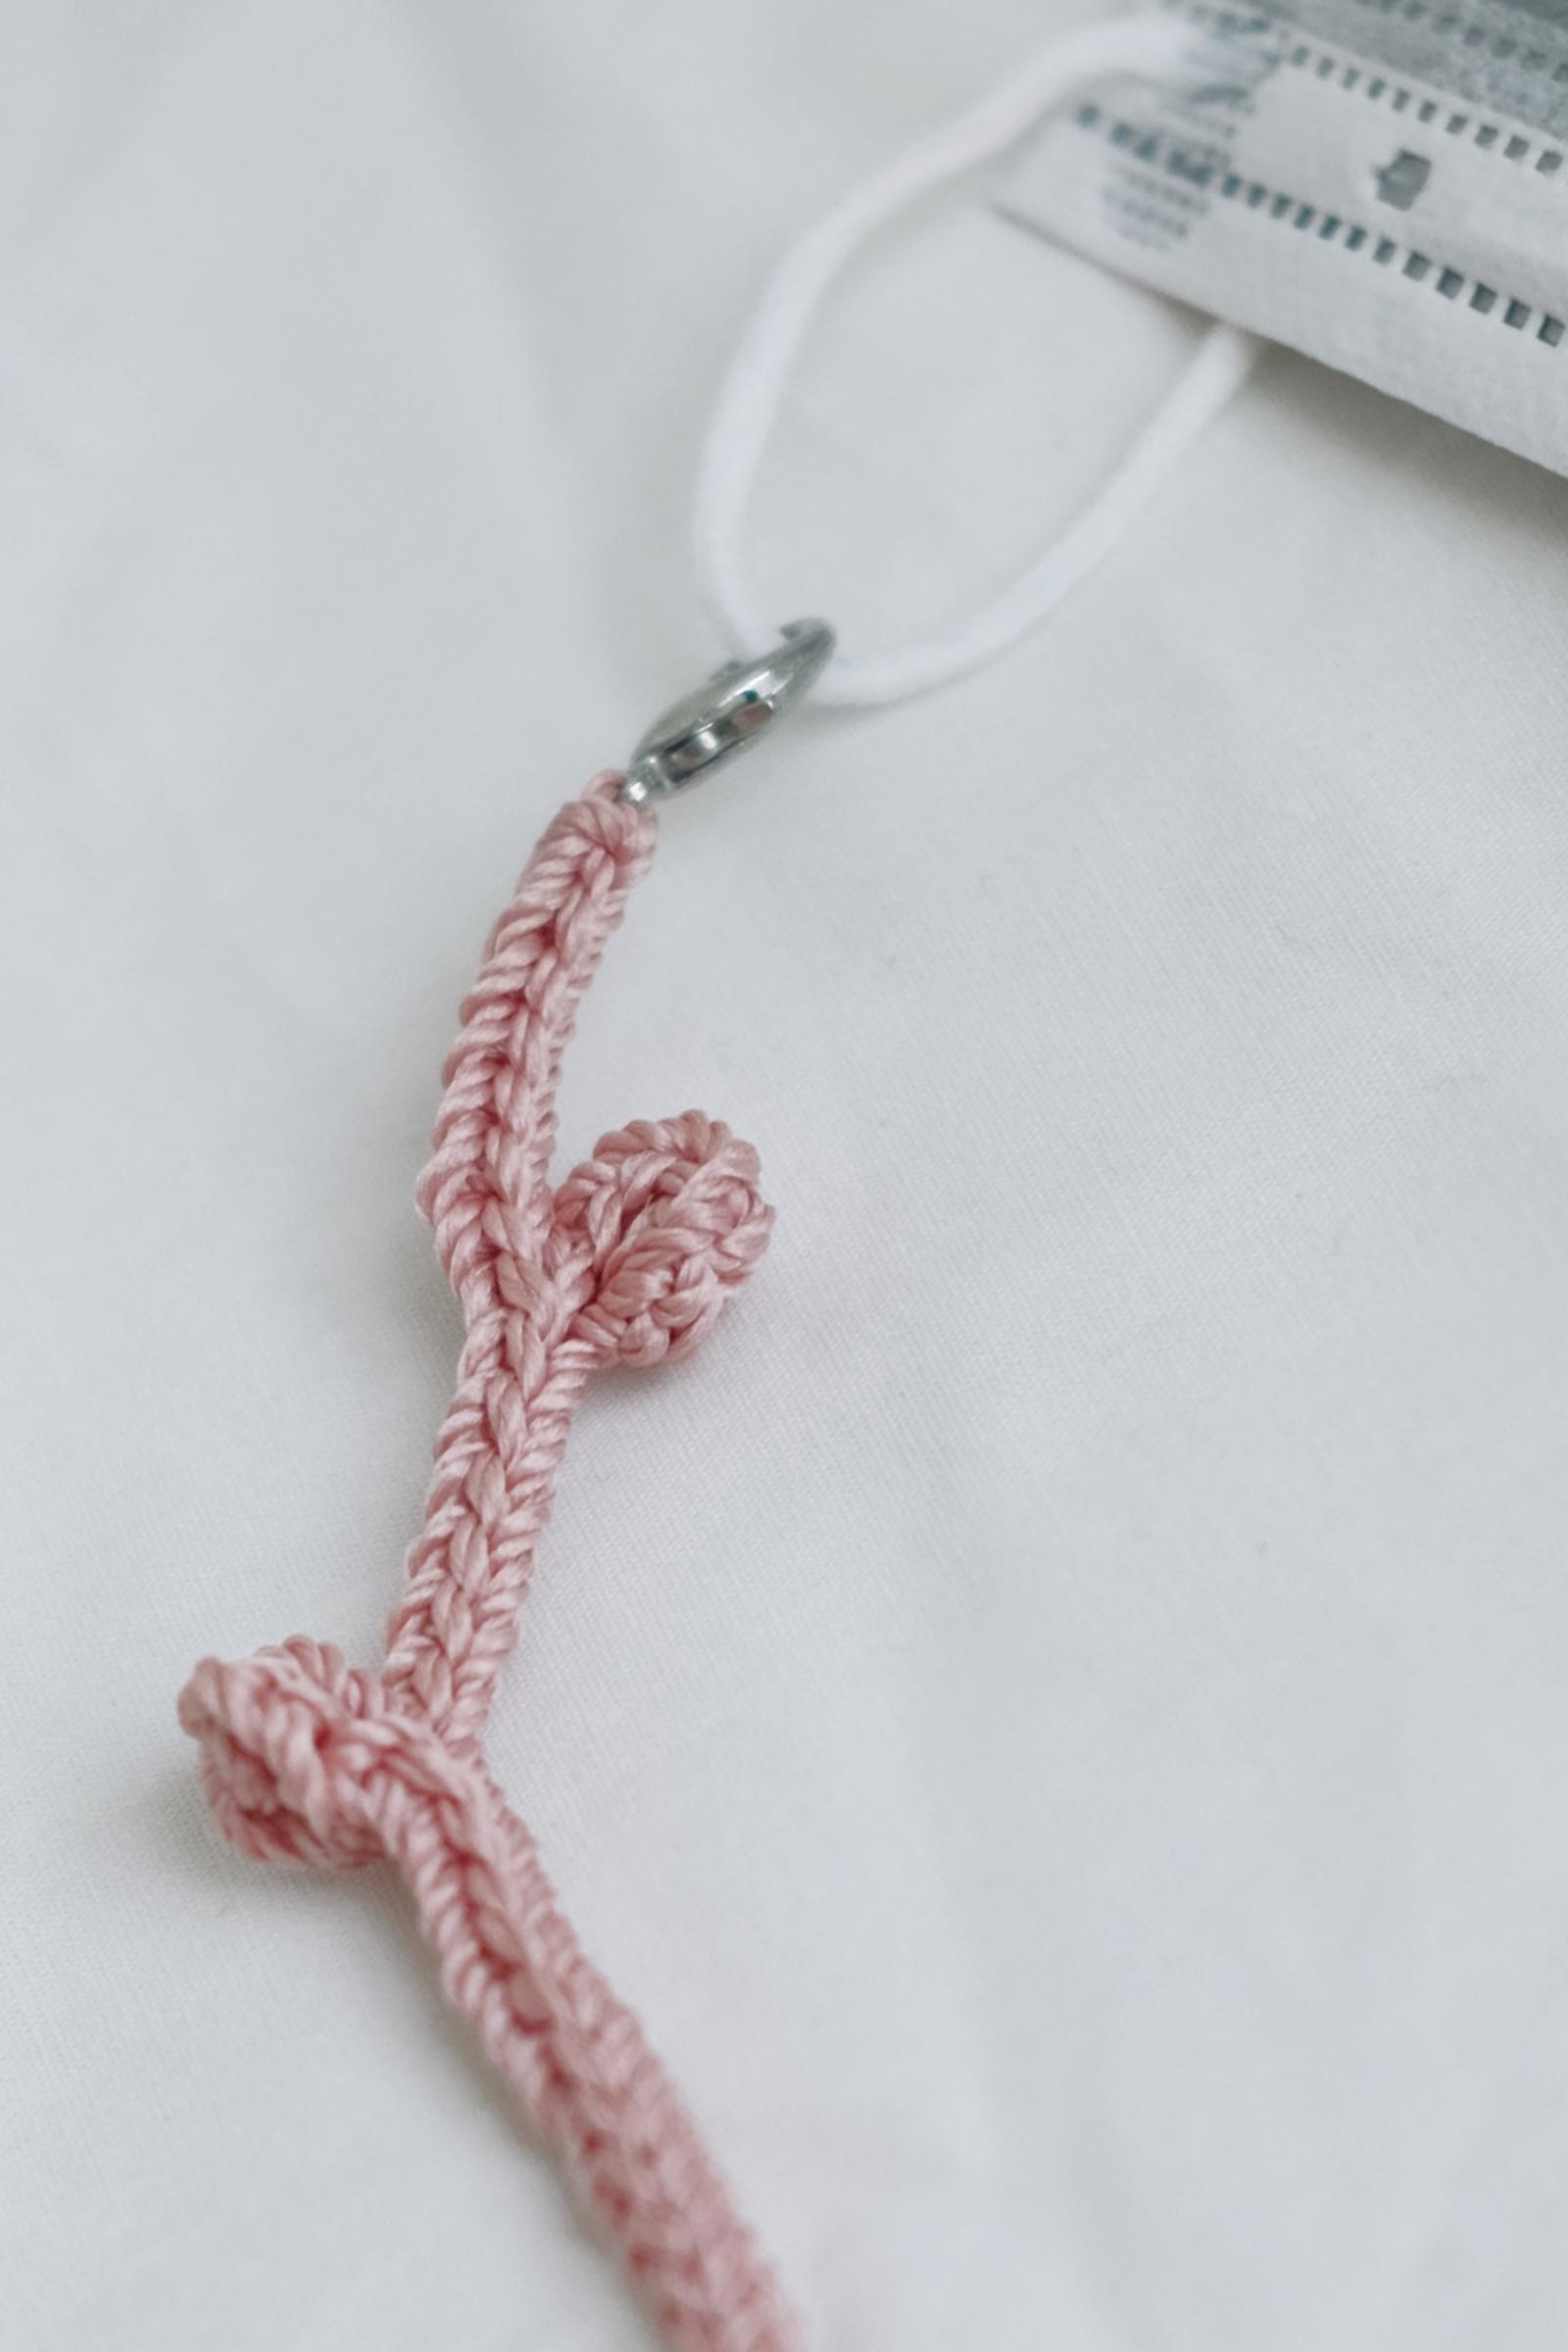 Picture of Handmade Crochet Mask Strap Pinkblush